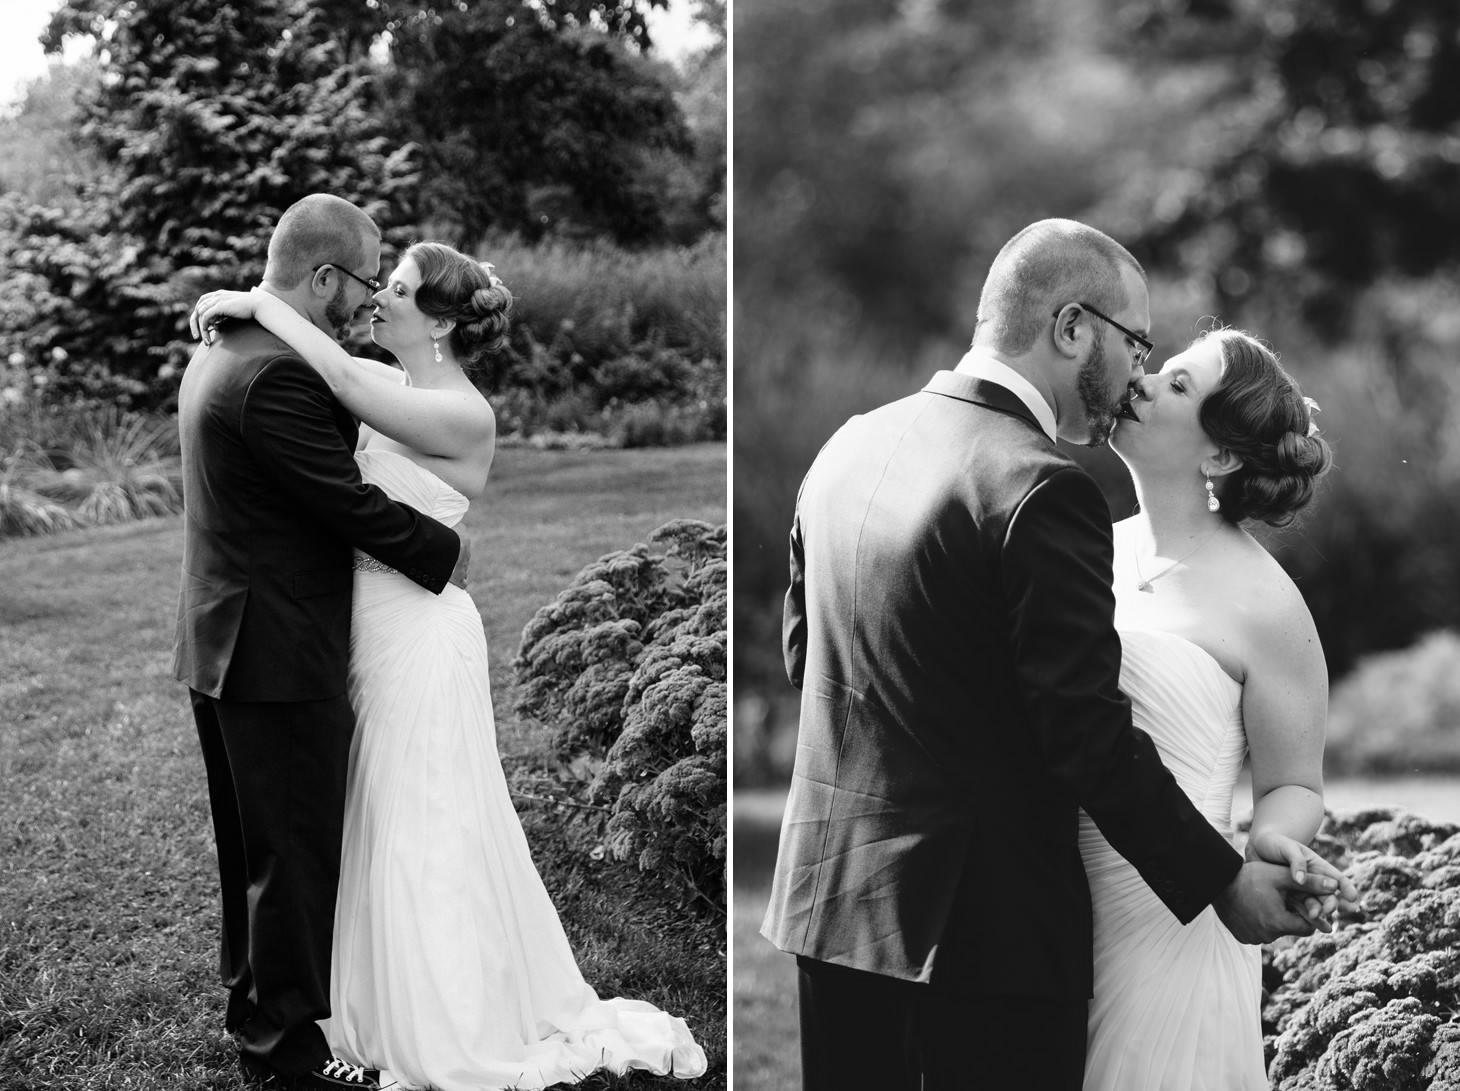 022-nyc-wedding-photographer-nj-nerdy-dr-who-firehouse-wedding-smitten-chickens.jpg